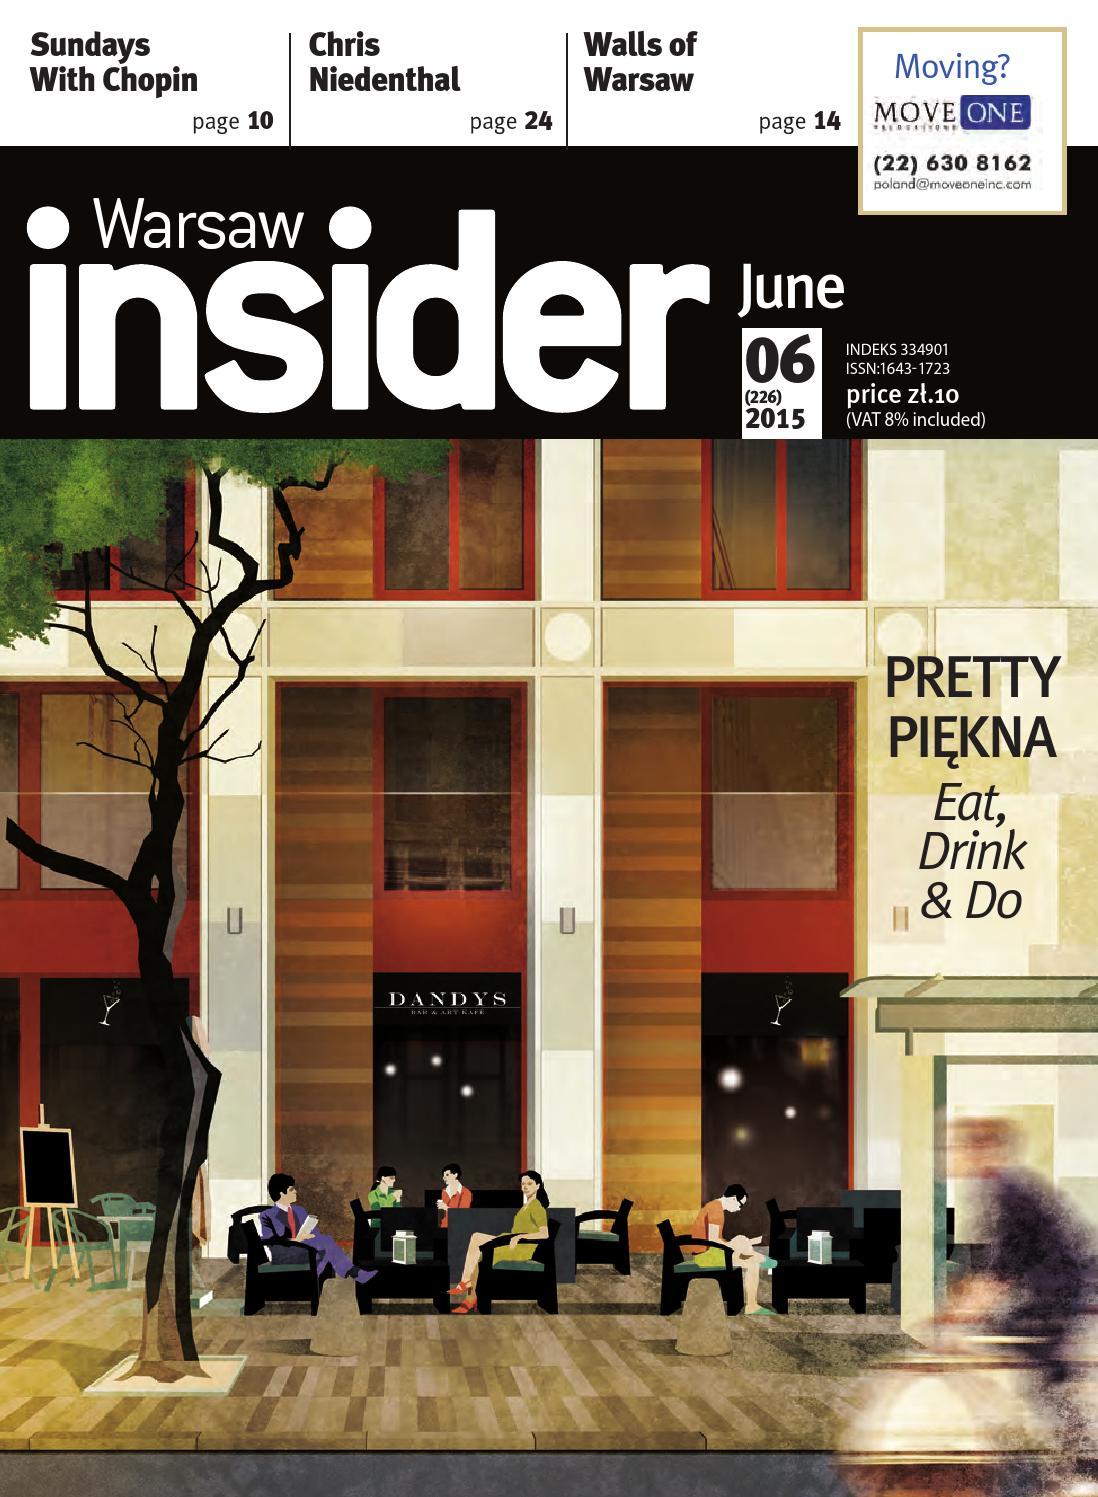 Warsaw Insider June 2015 226 By Valkea Media Pro Issuu